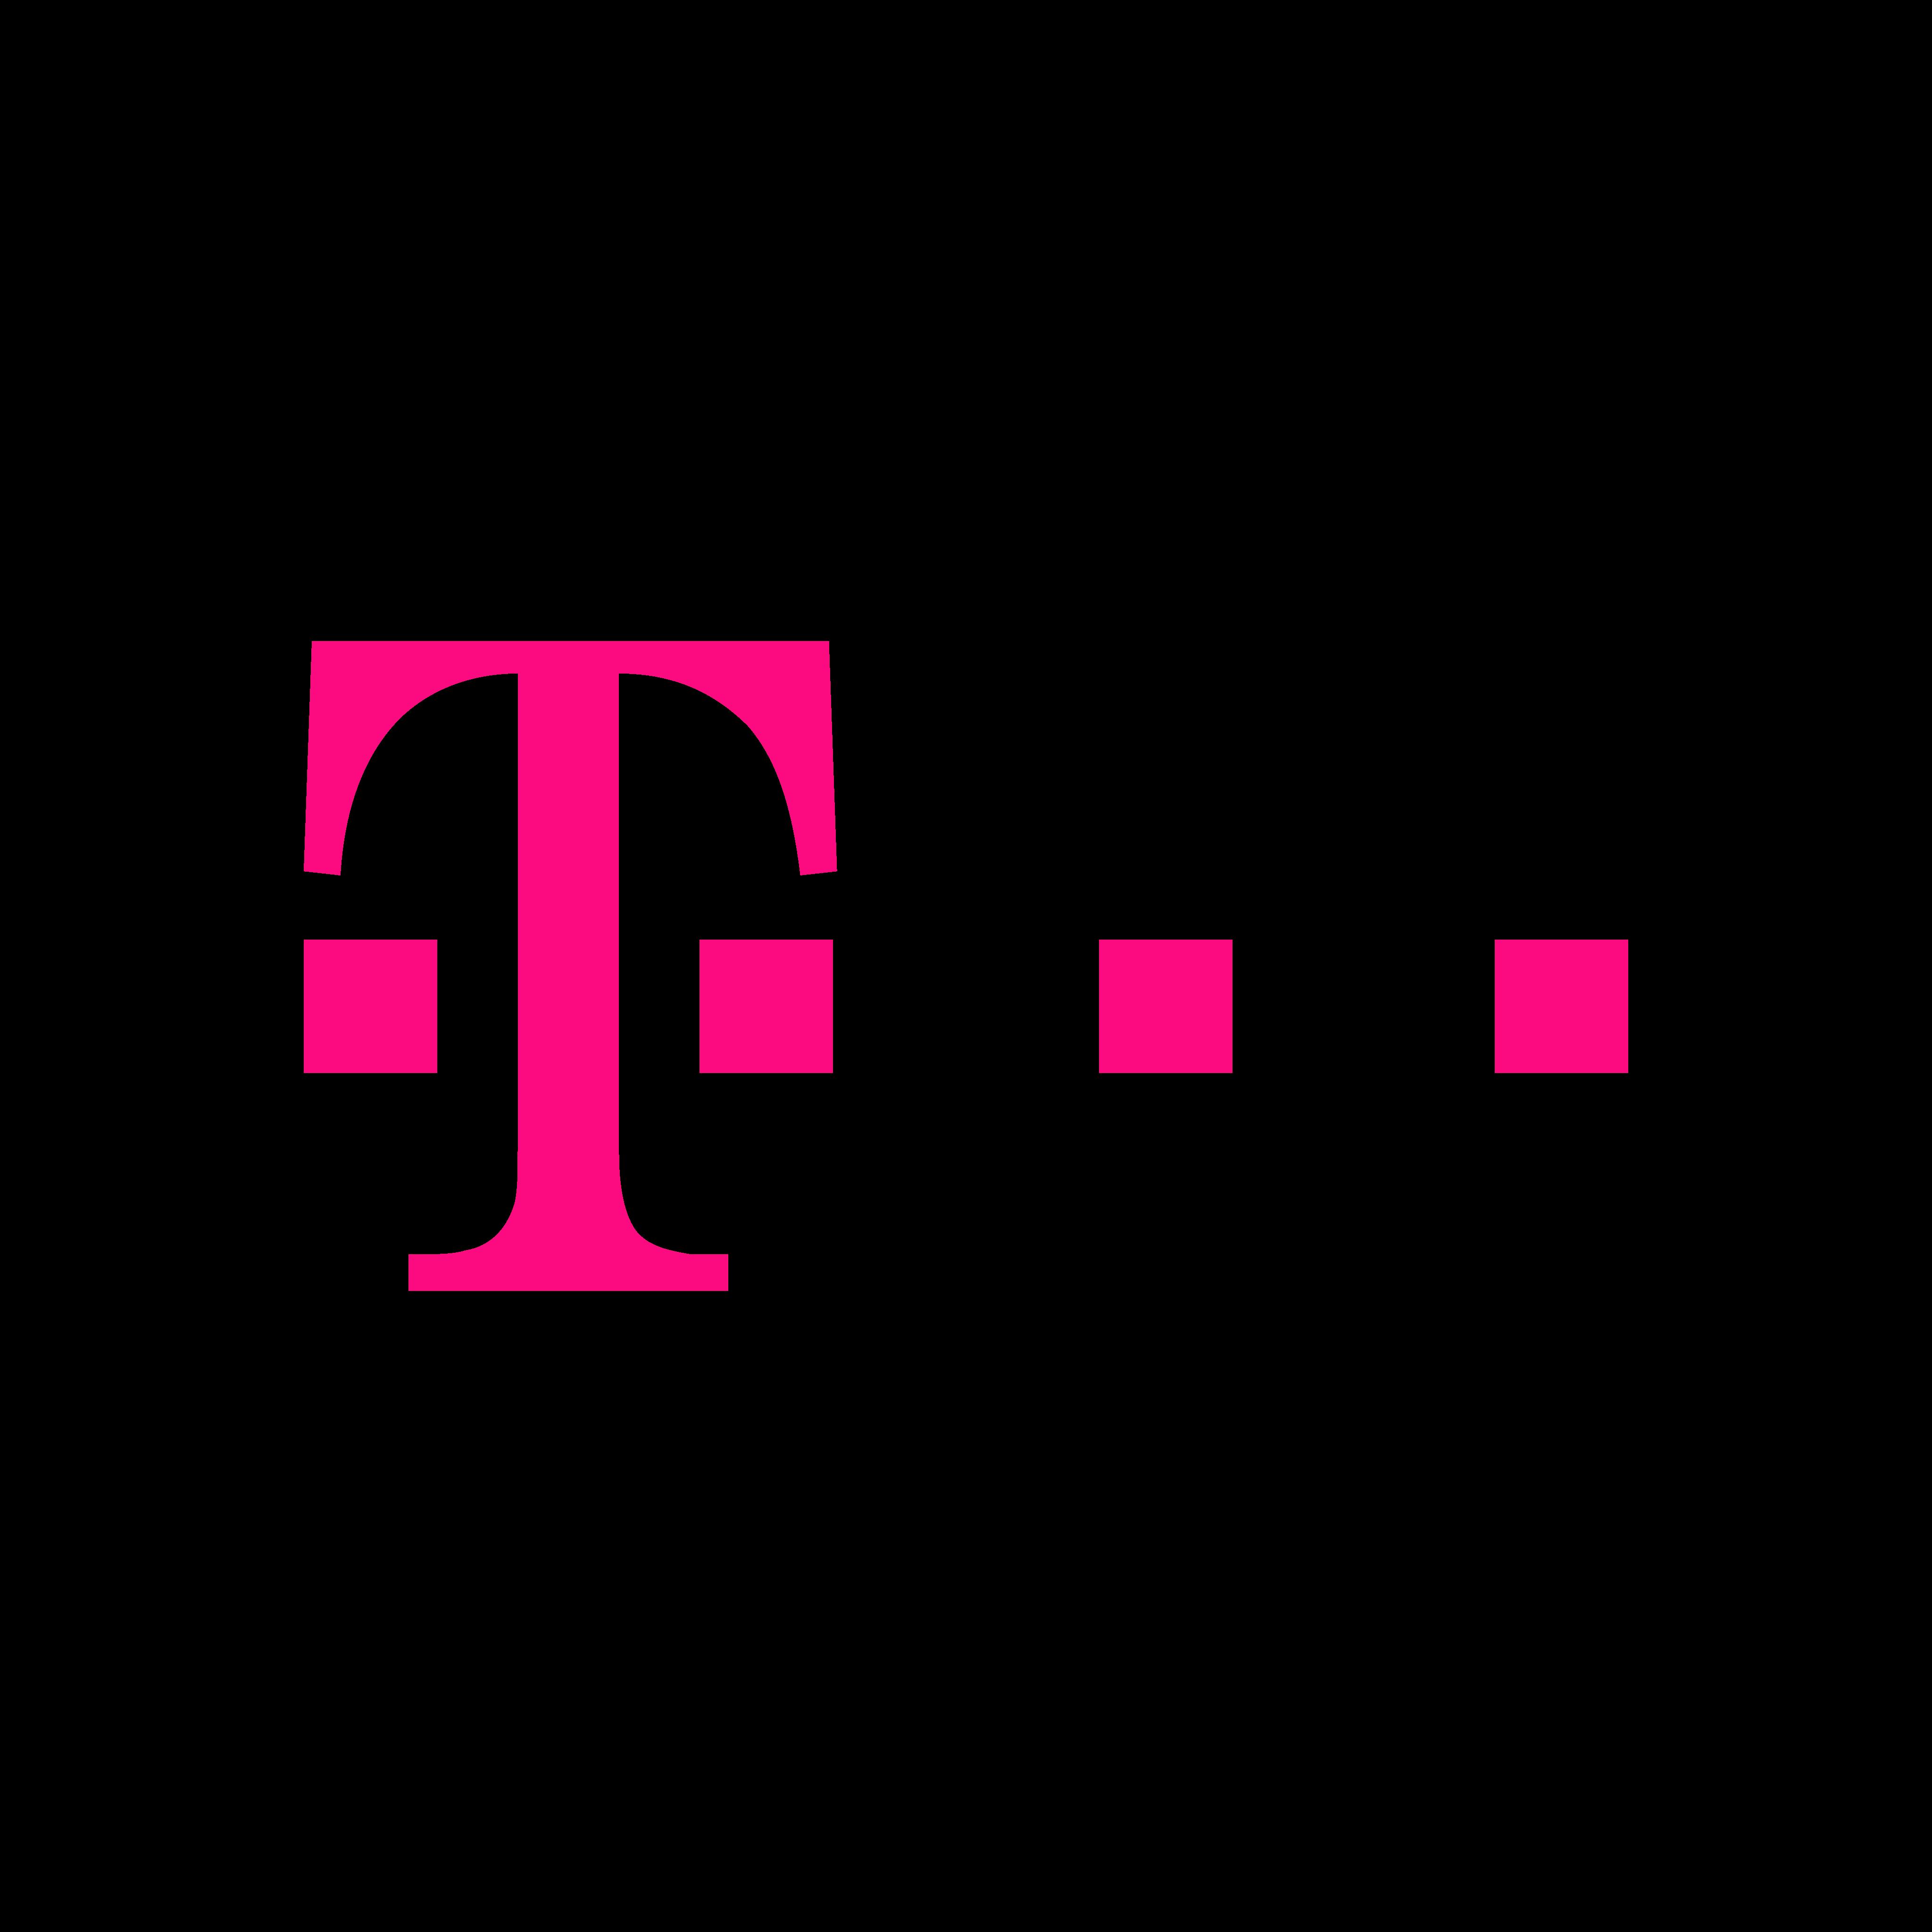 deutsche telekom logo 0 - Deutsche Telekom Logo